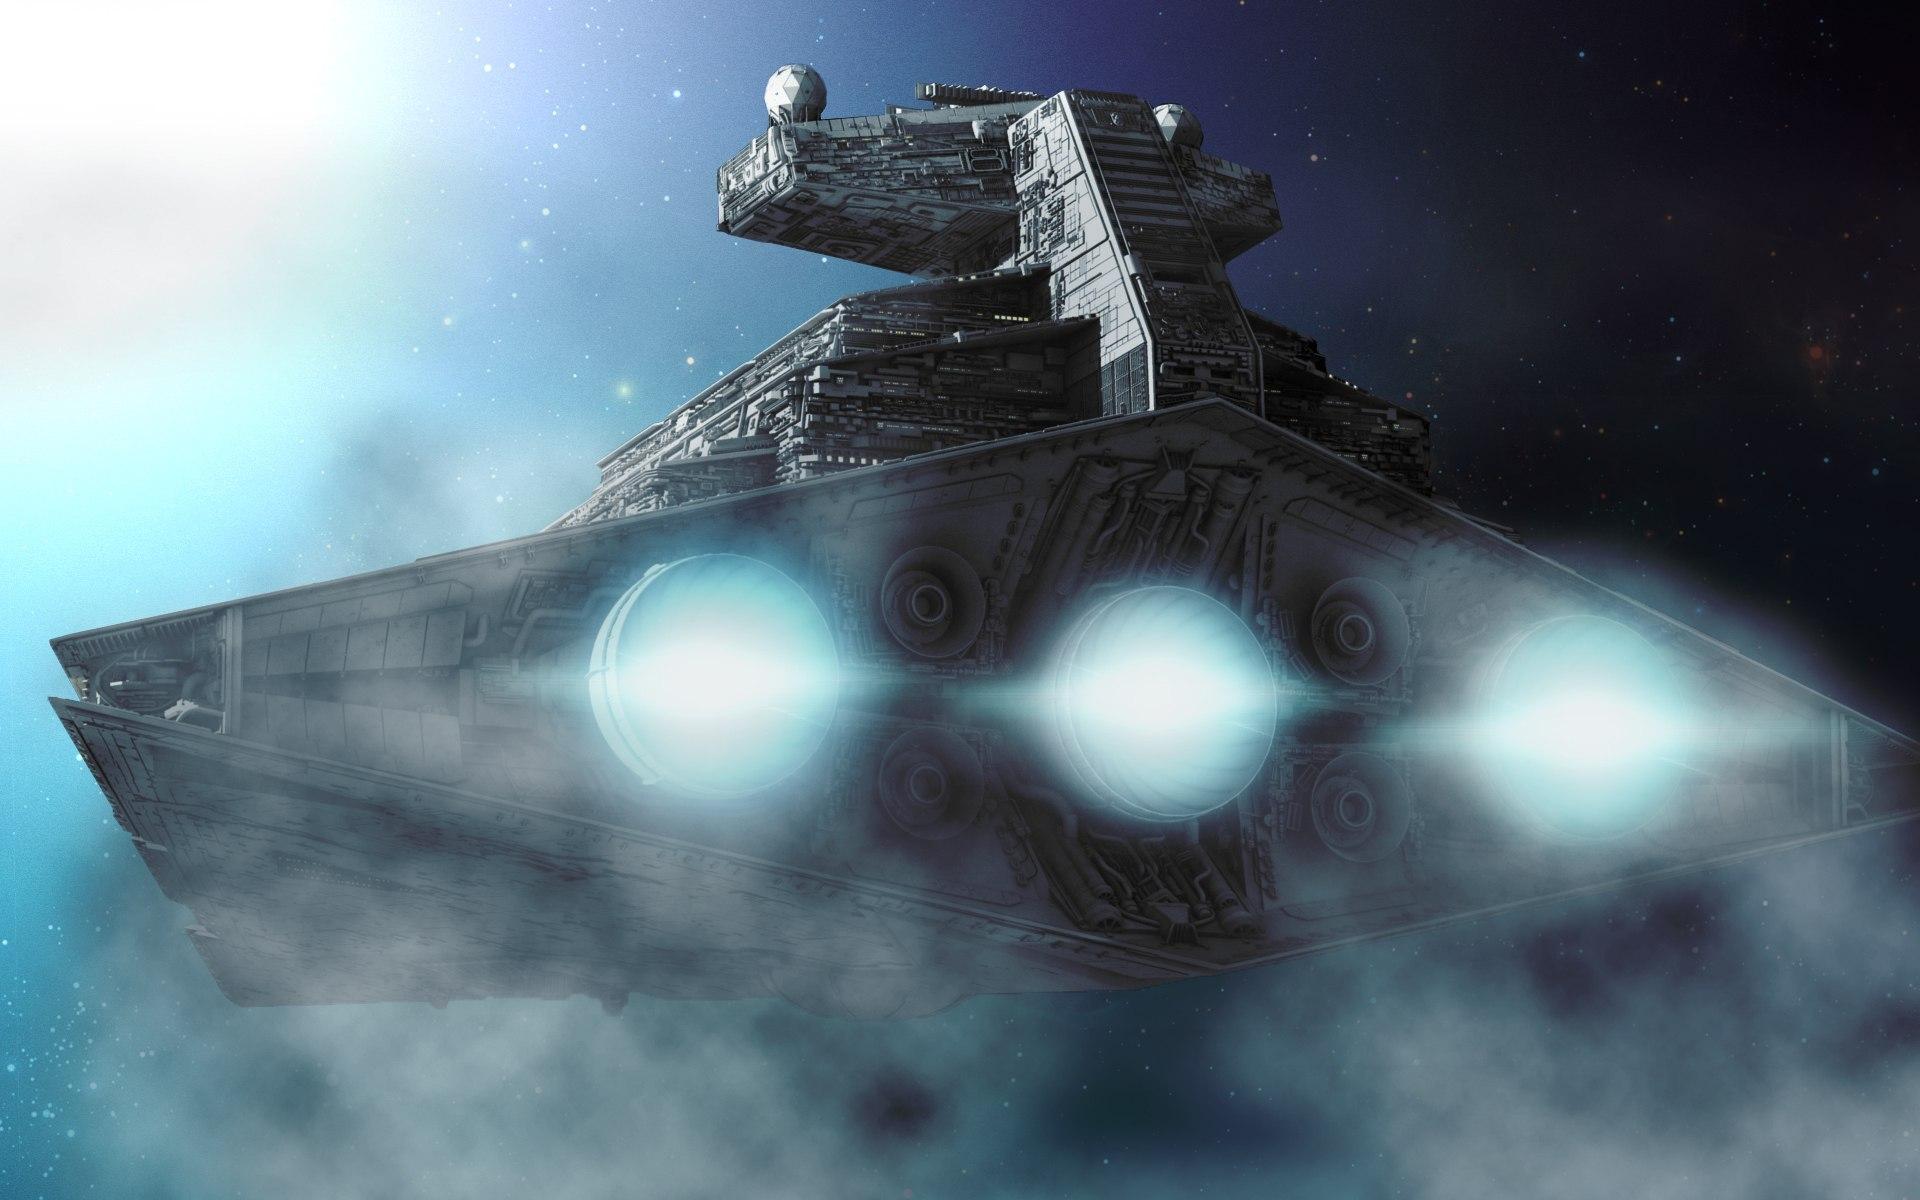 General 1920x1200 Star Wars Star Destroyer digital art spaceship Imperial Forces science fiction Star Wars Ships